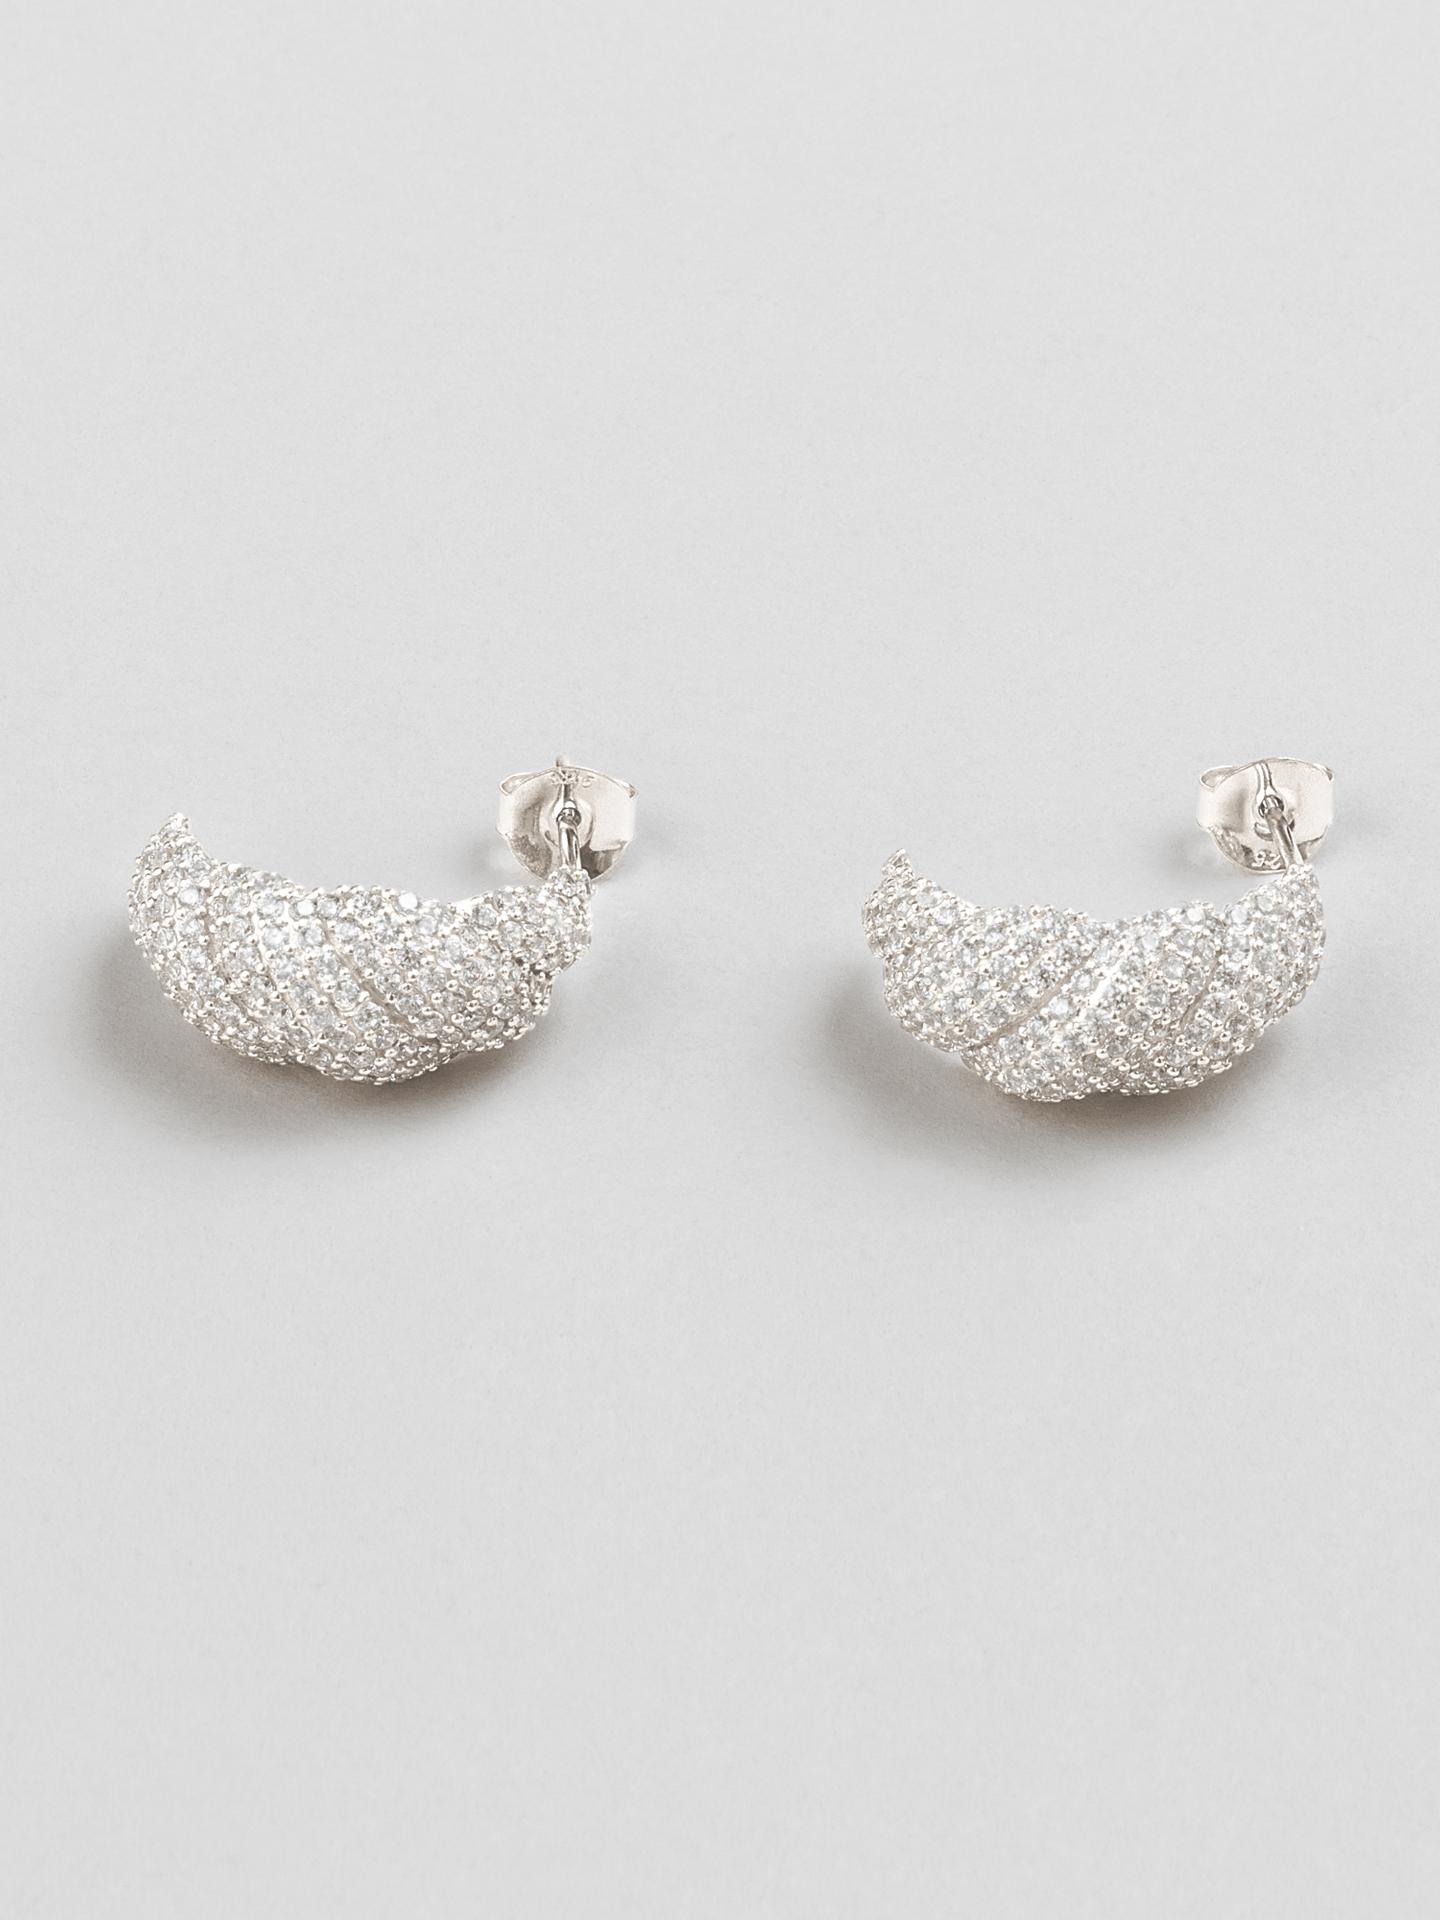 Croissant Earrings